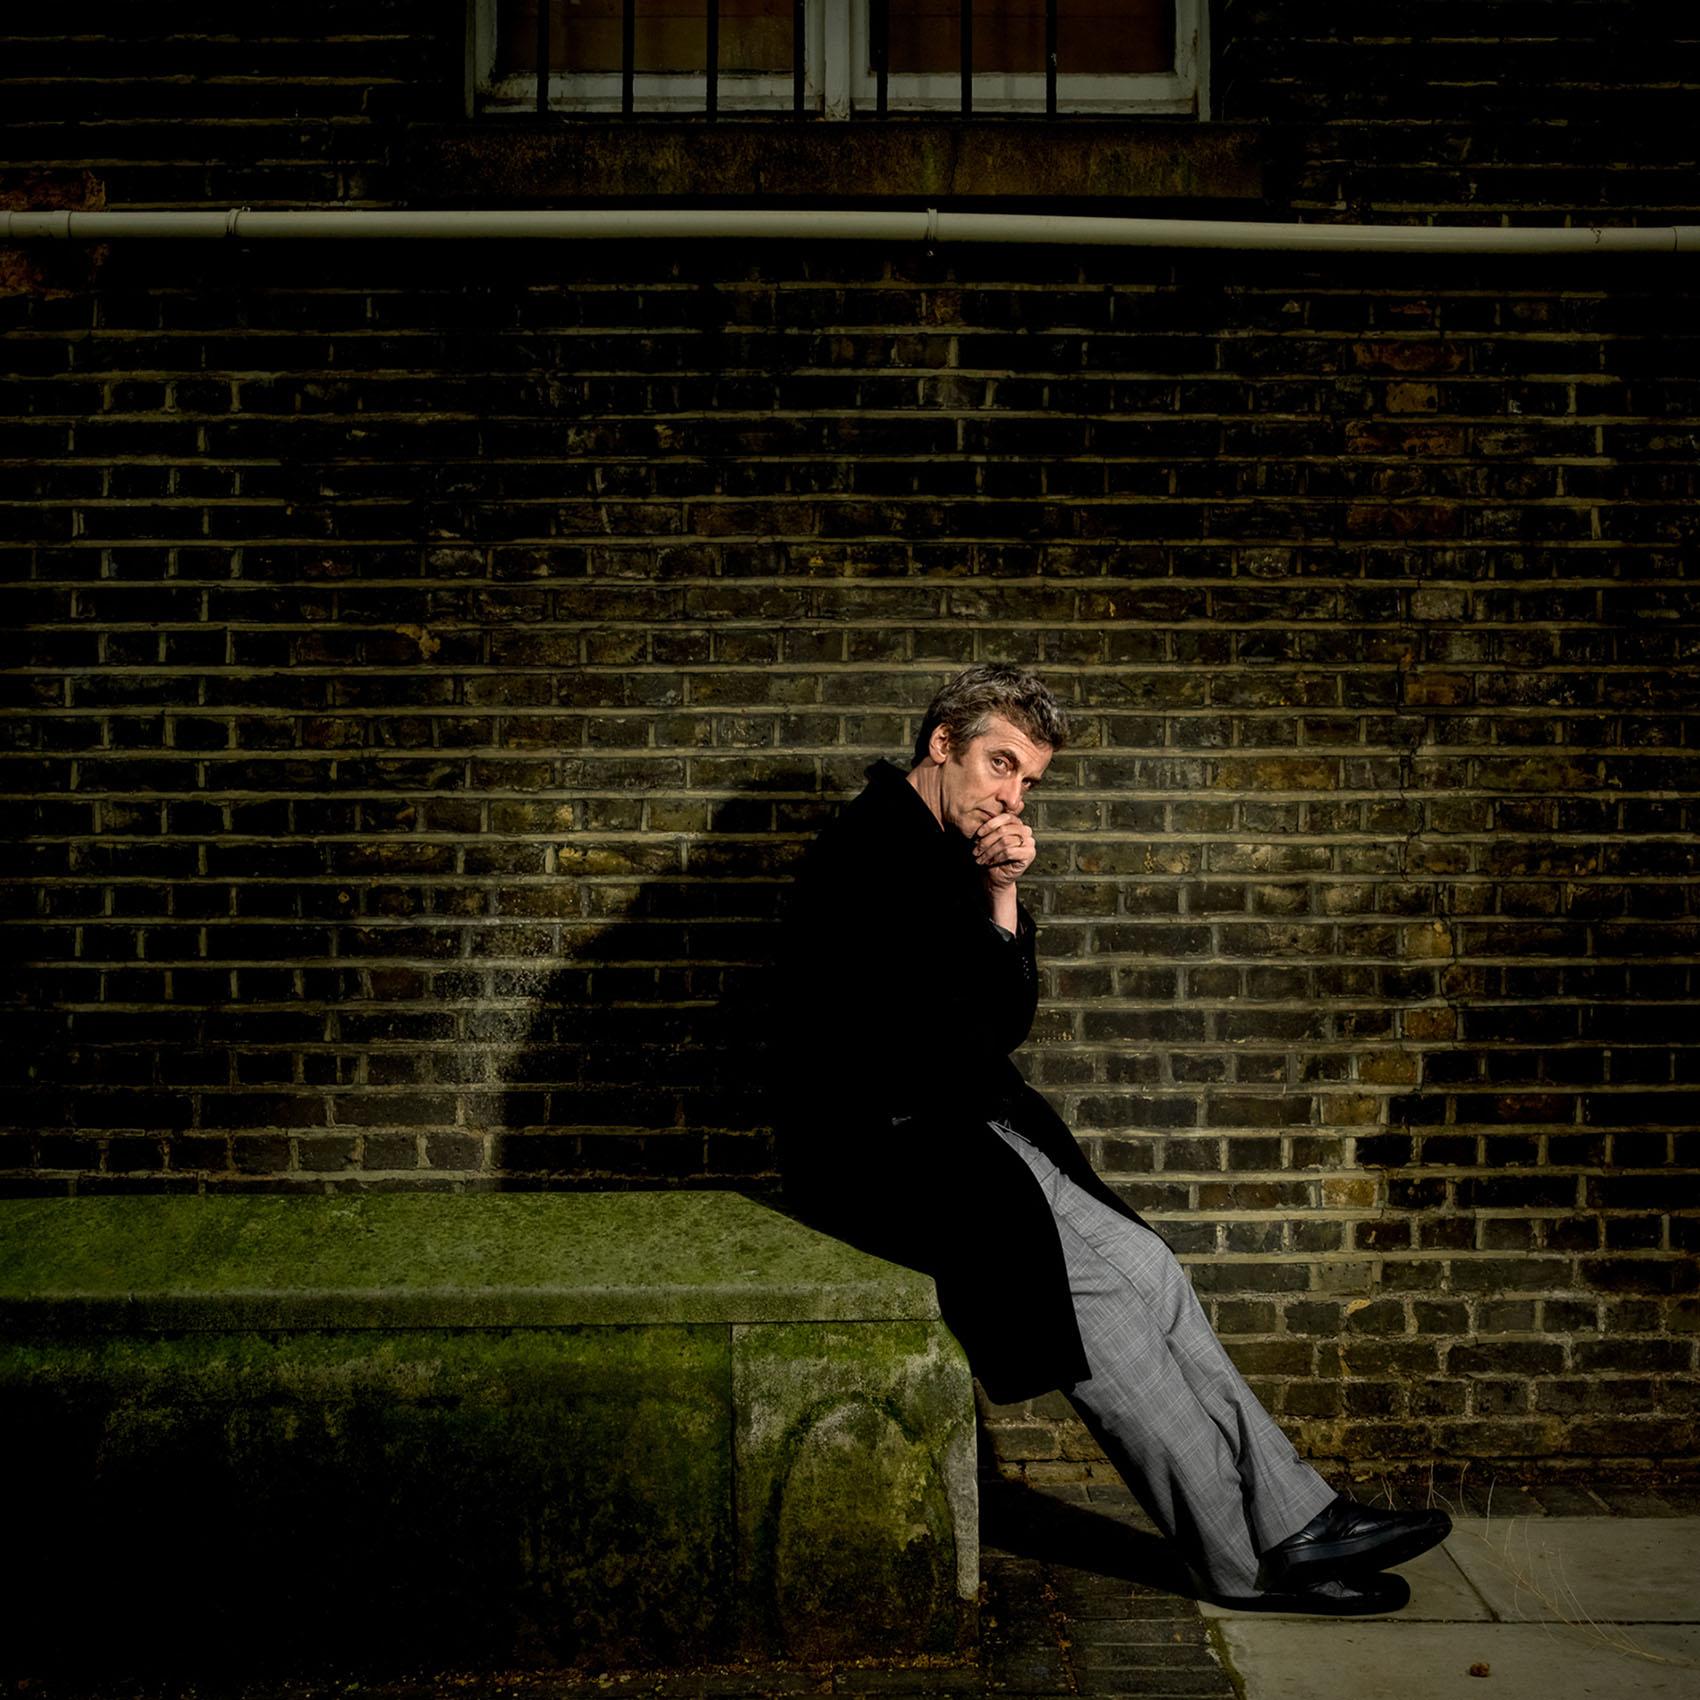 Peter Capaldi -  actor